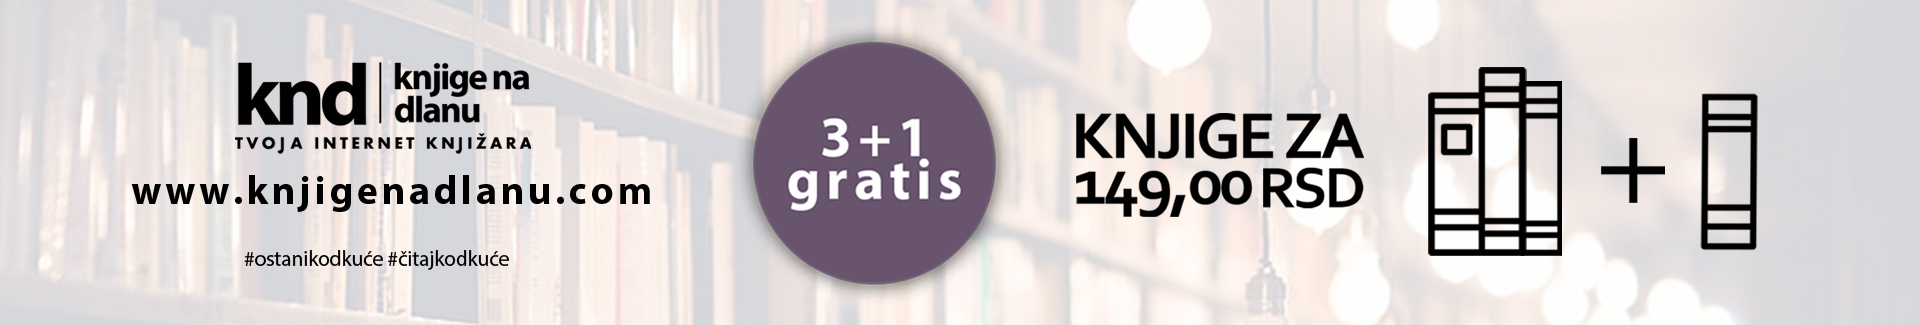 Knjige za 145rsd 3+1 gratis  – Slider